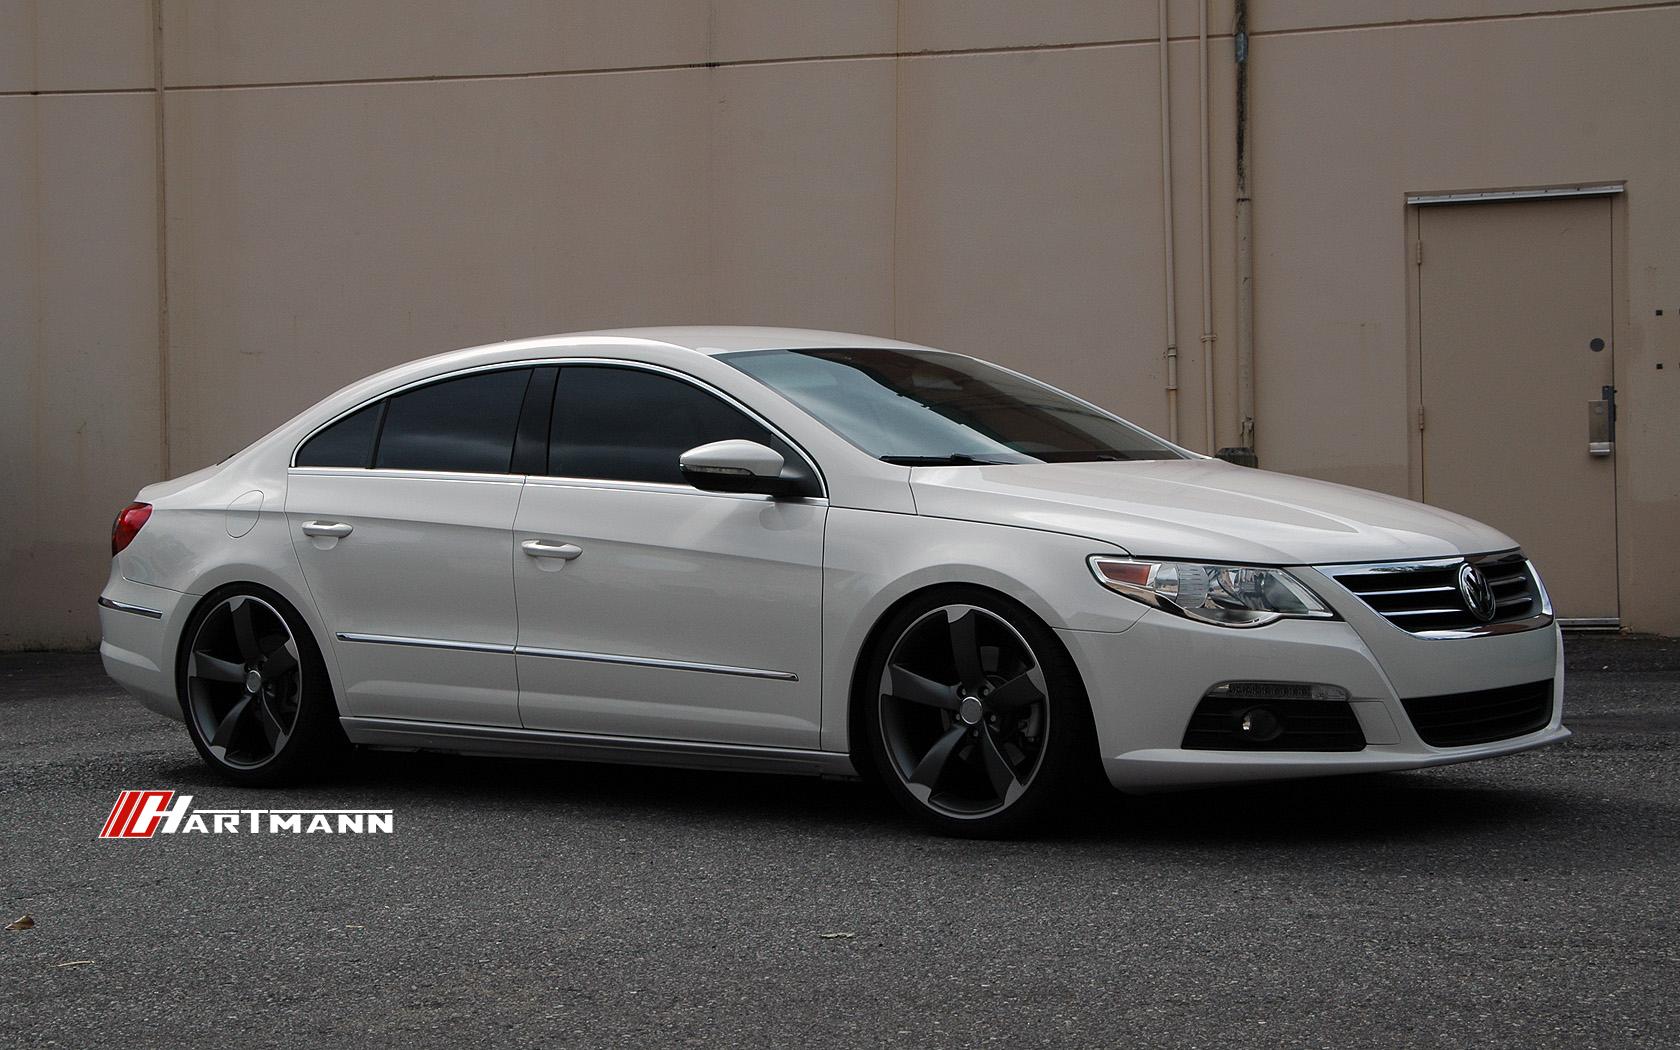 Hartmann Htt 256 Ma M Wheels For Volkswagen Fitment